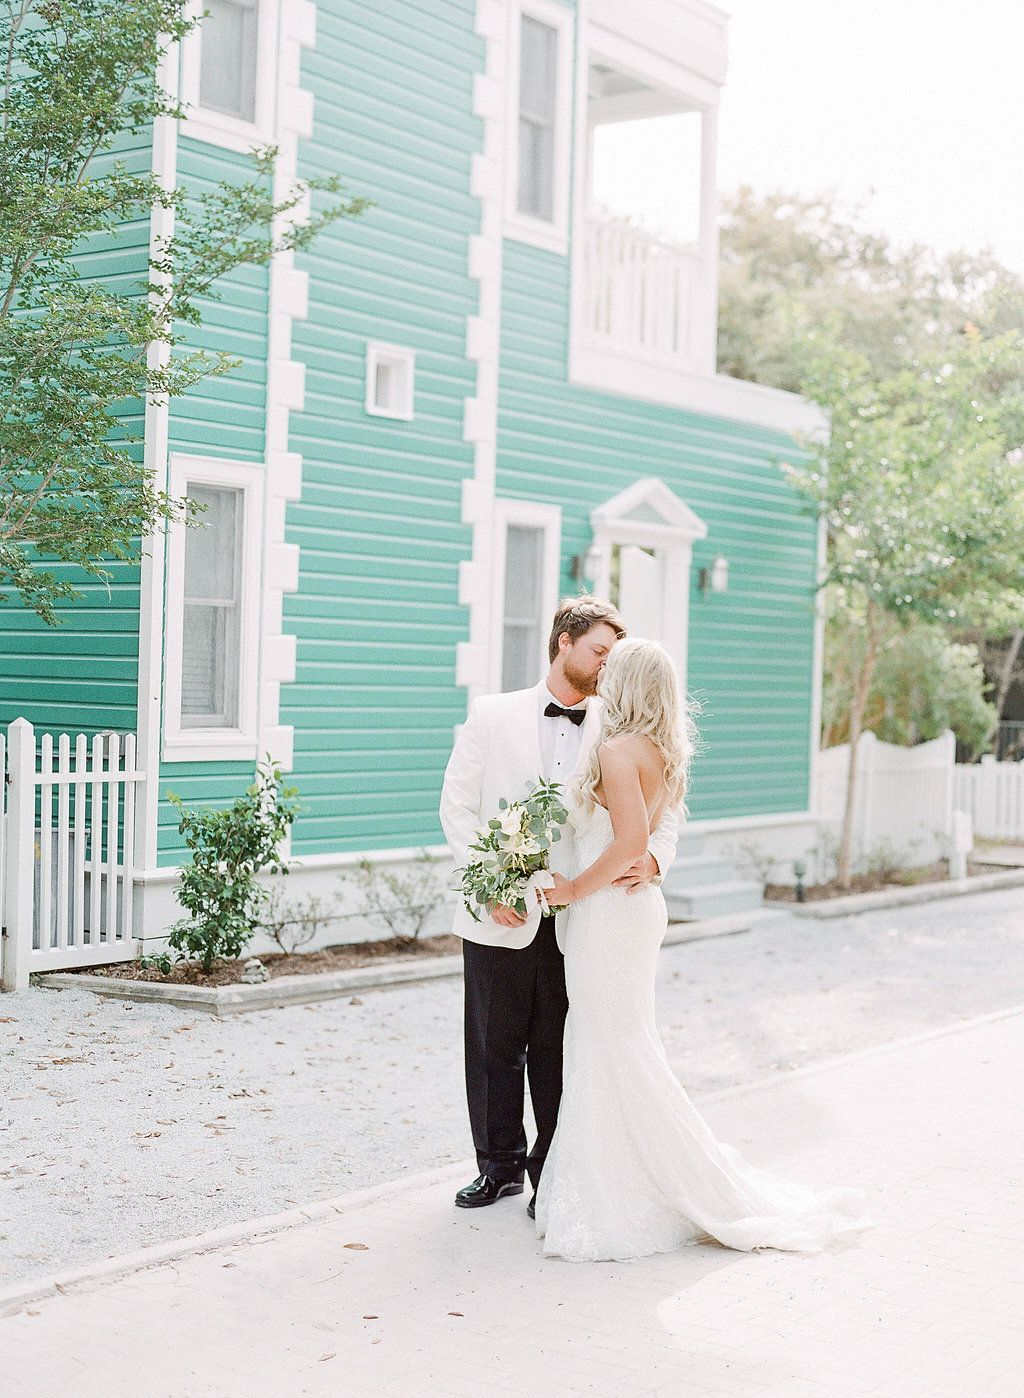 Wedding Photography in Seaside, Florida. Colorful Wedding Venue ...